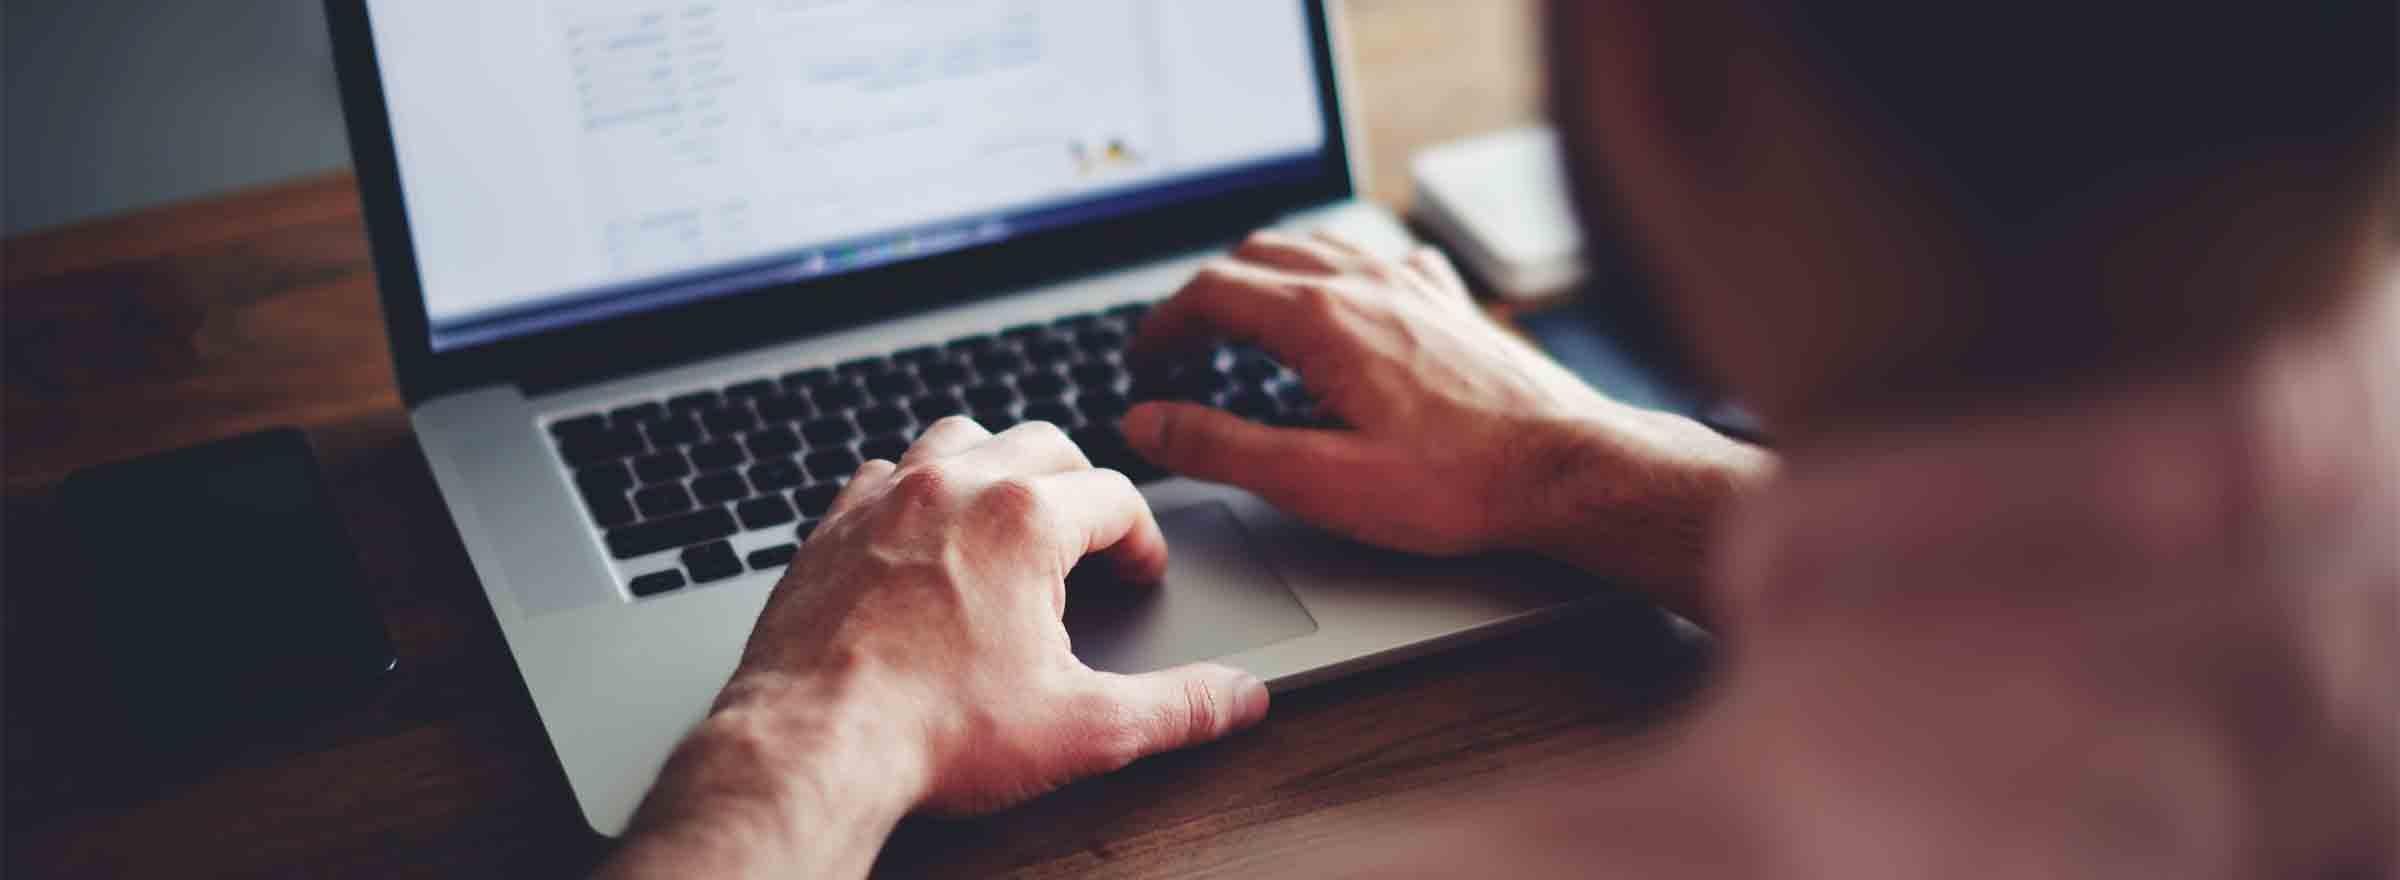 hands of a man using a laptop